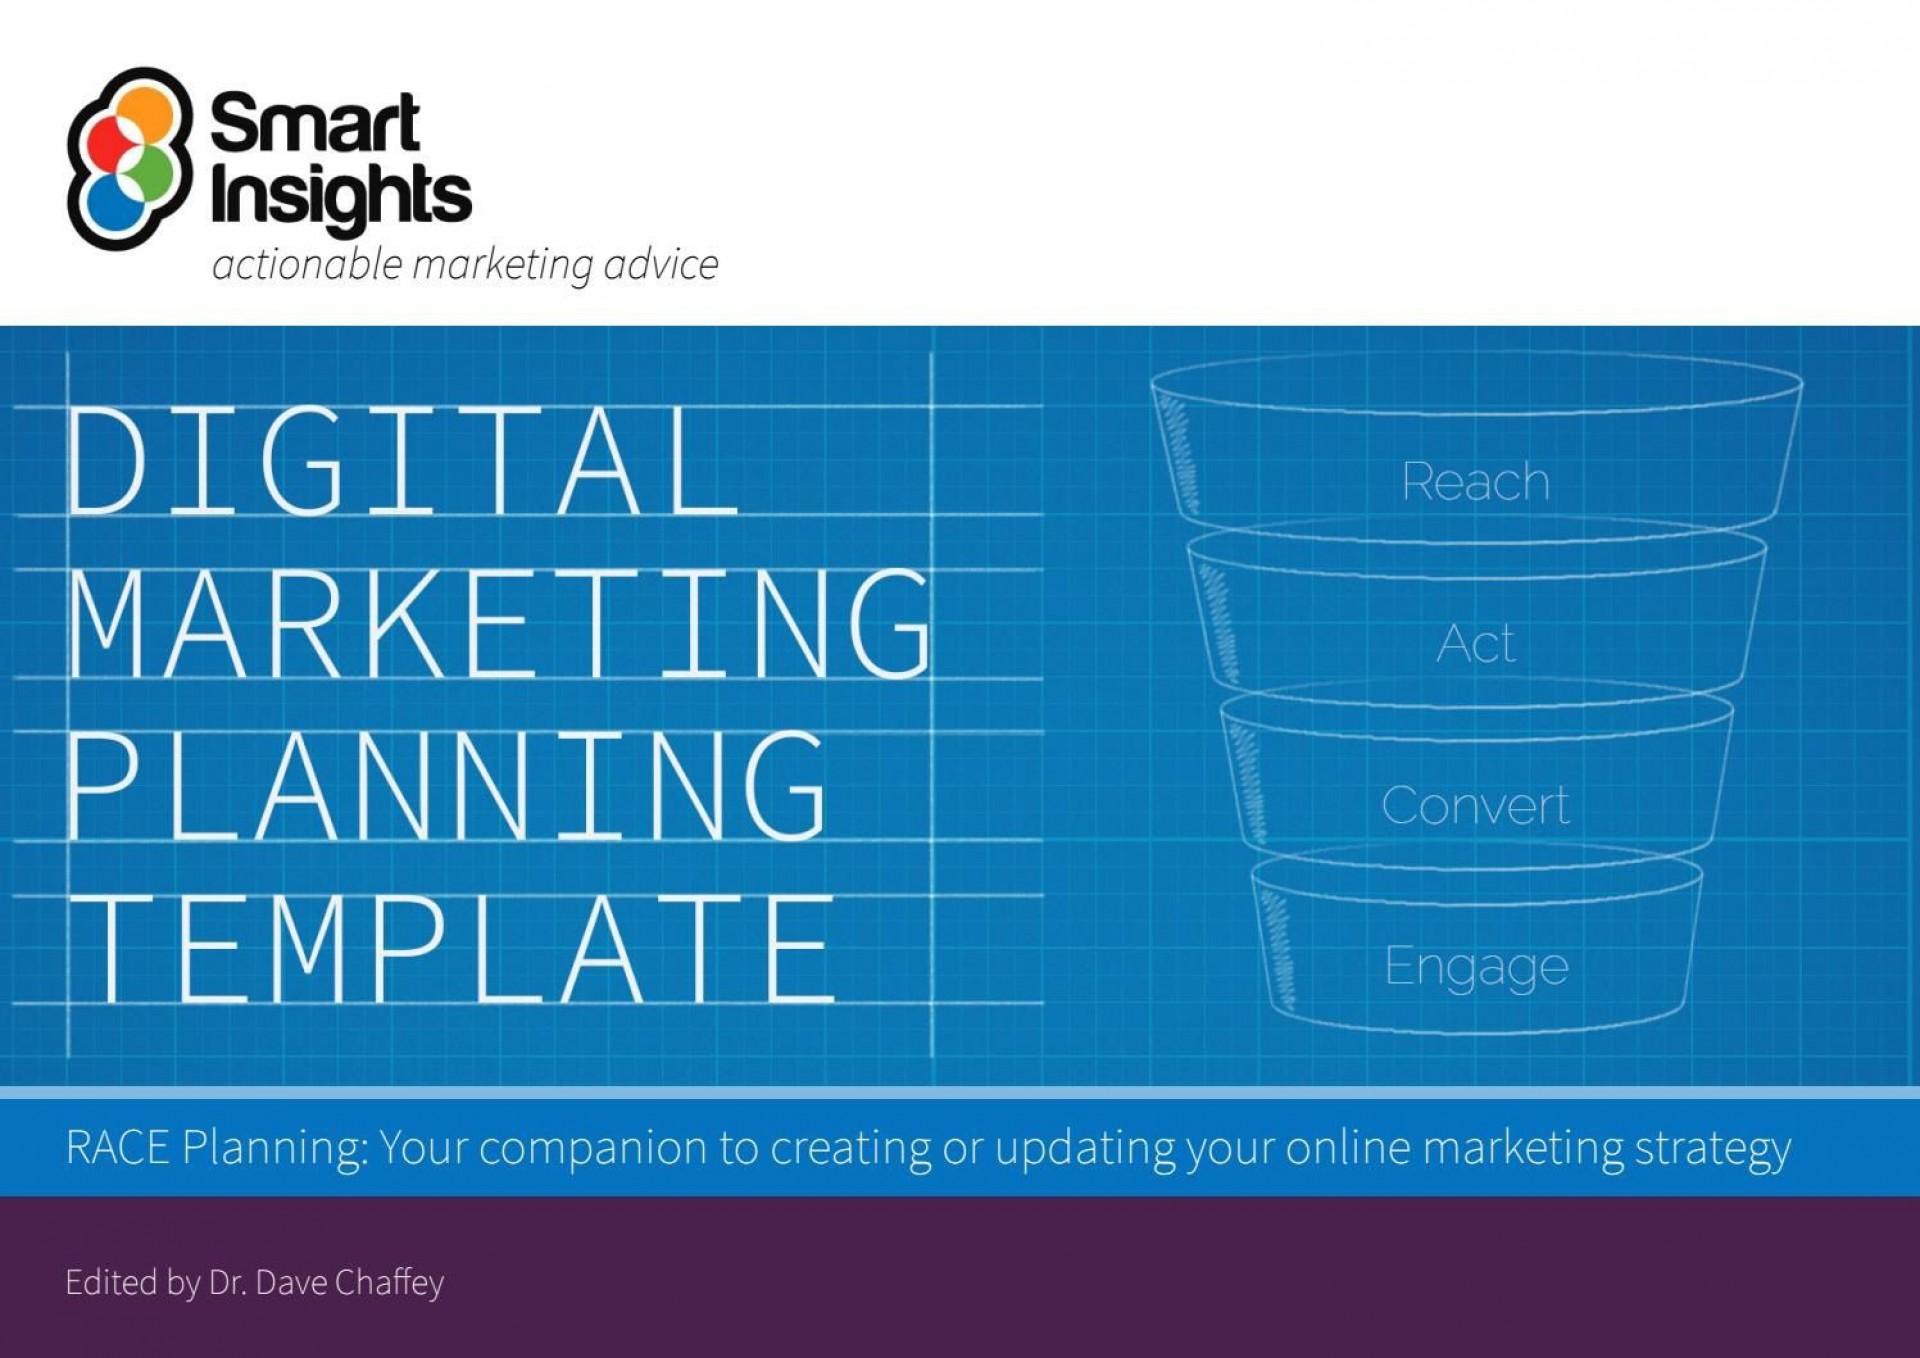 010 Fascinating Digital Marketing Plan Example Doc High Definition  Template Sample1920